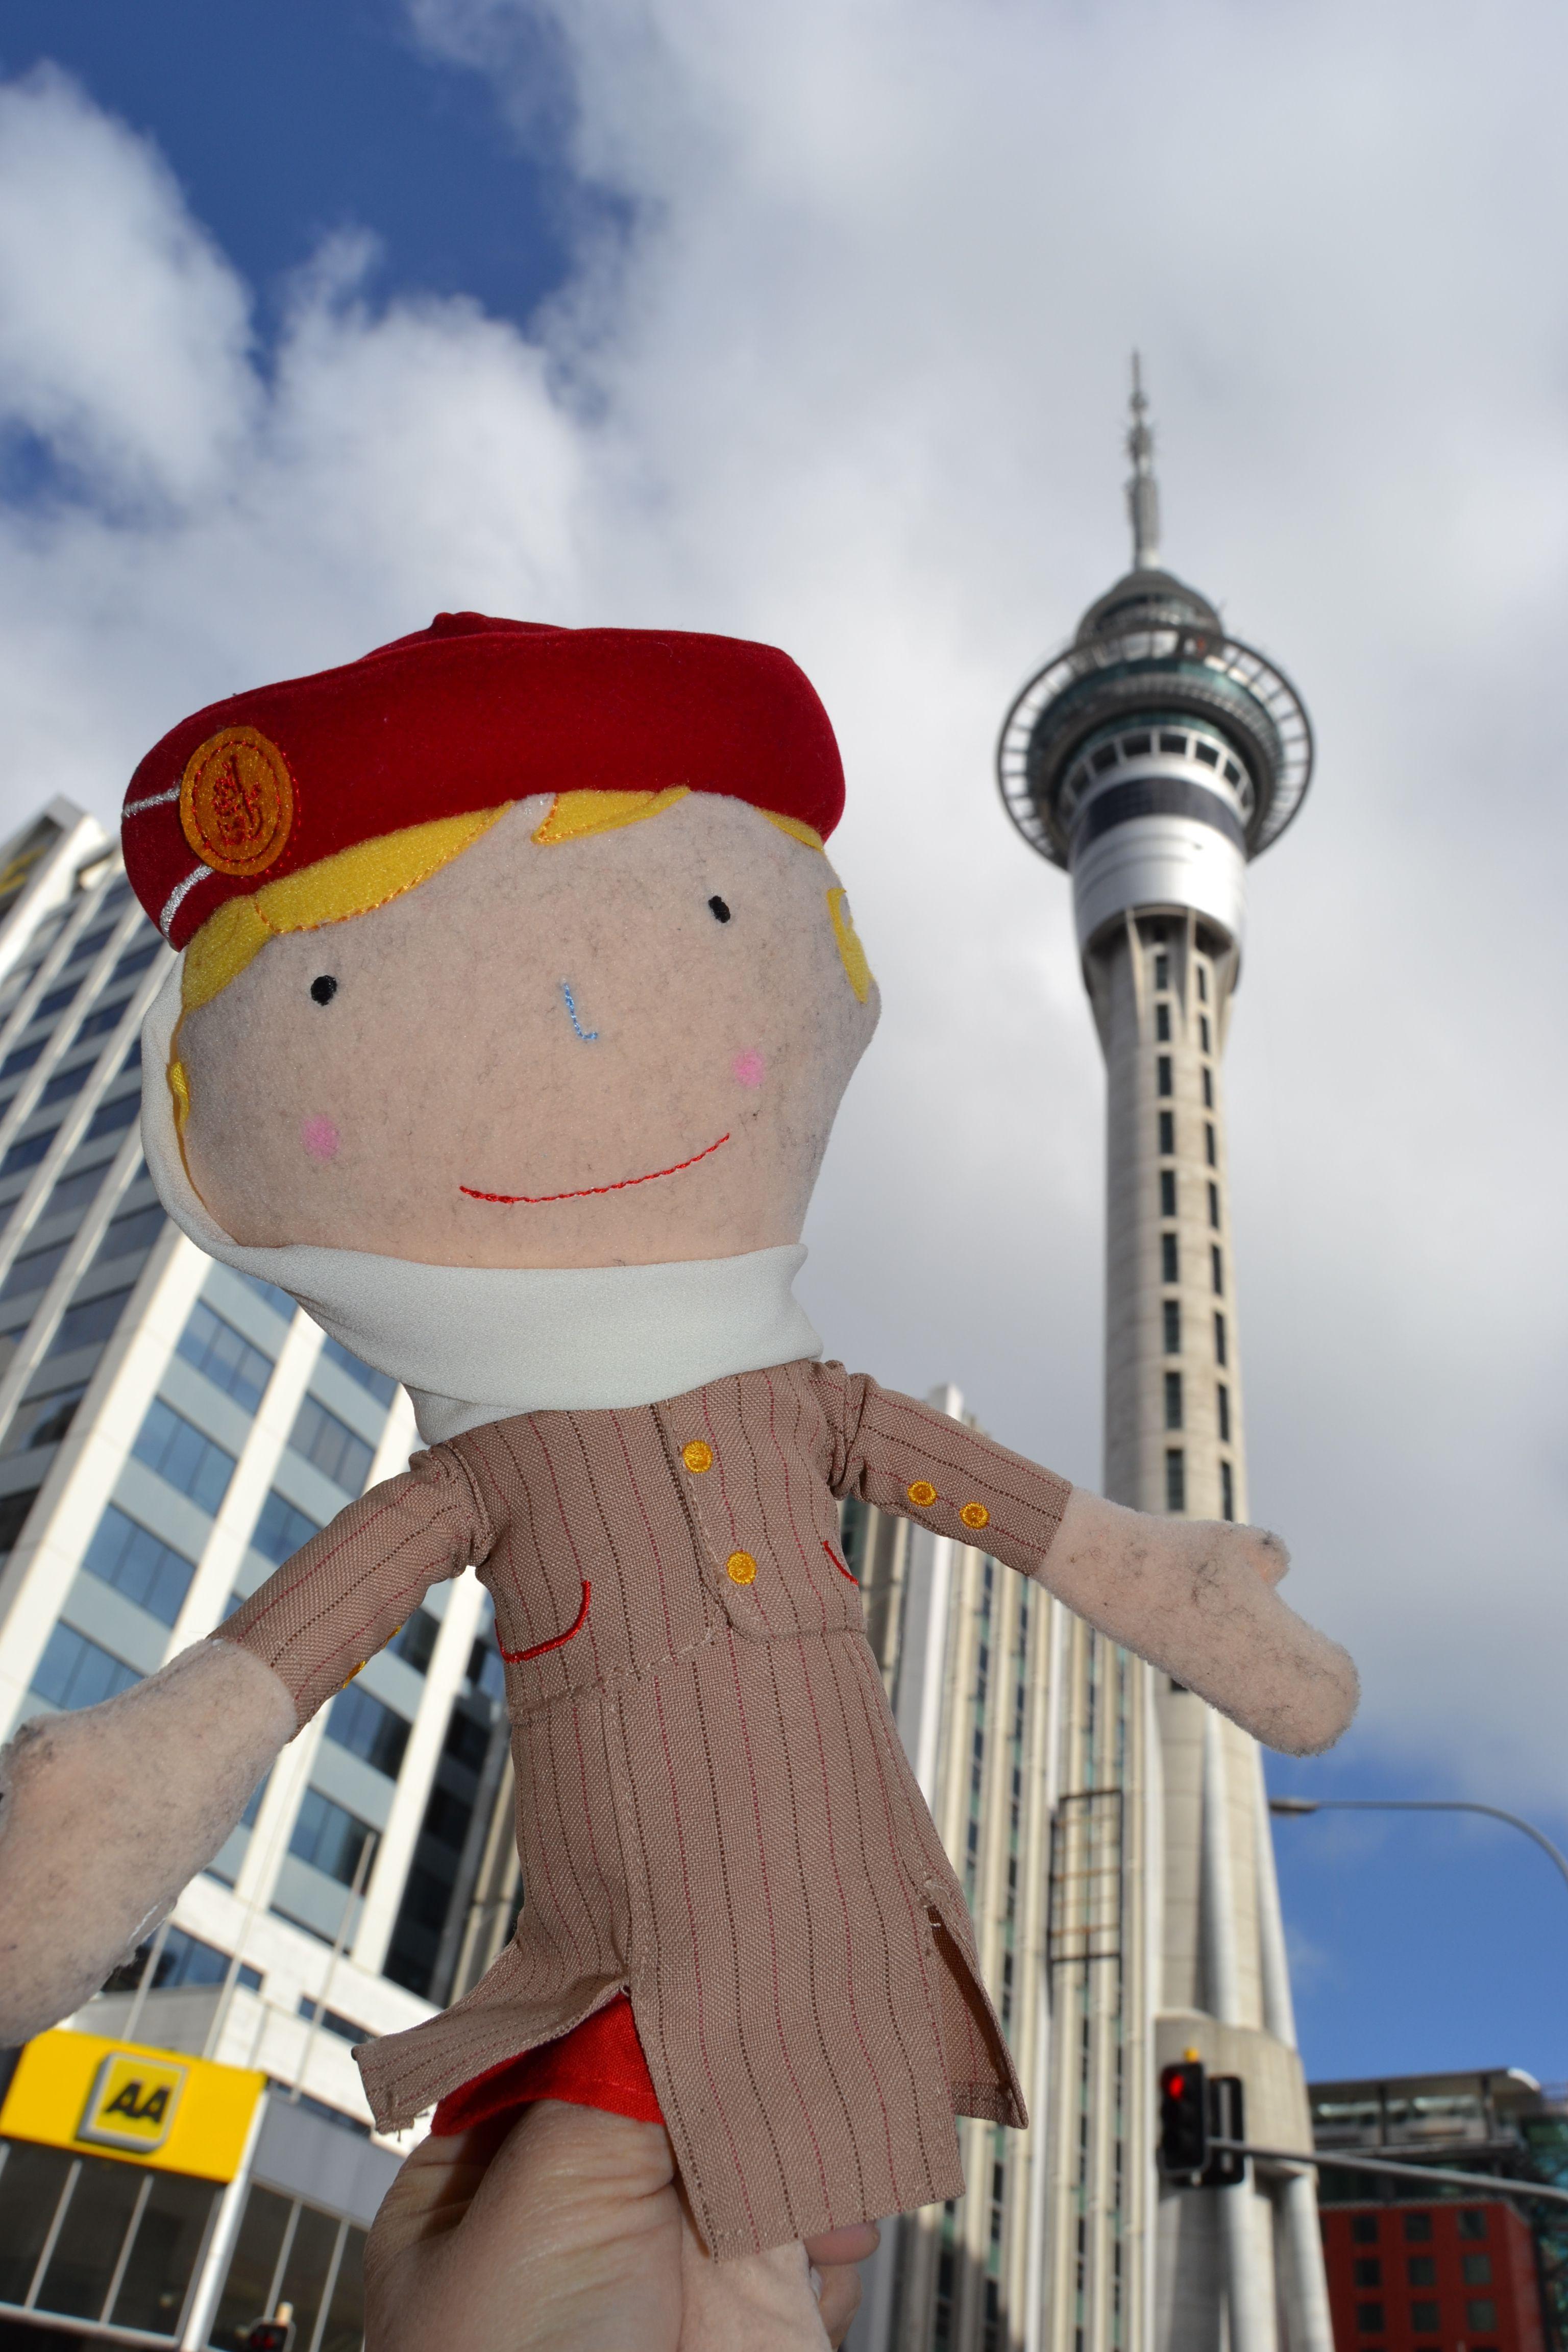 Auckland, New Zealand. August 2015